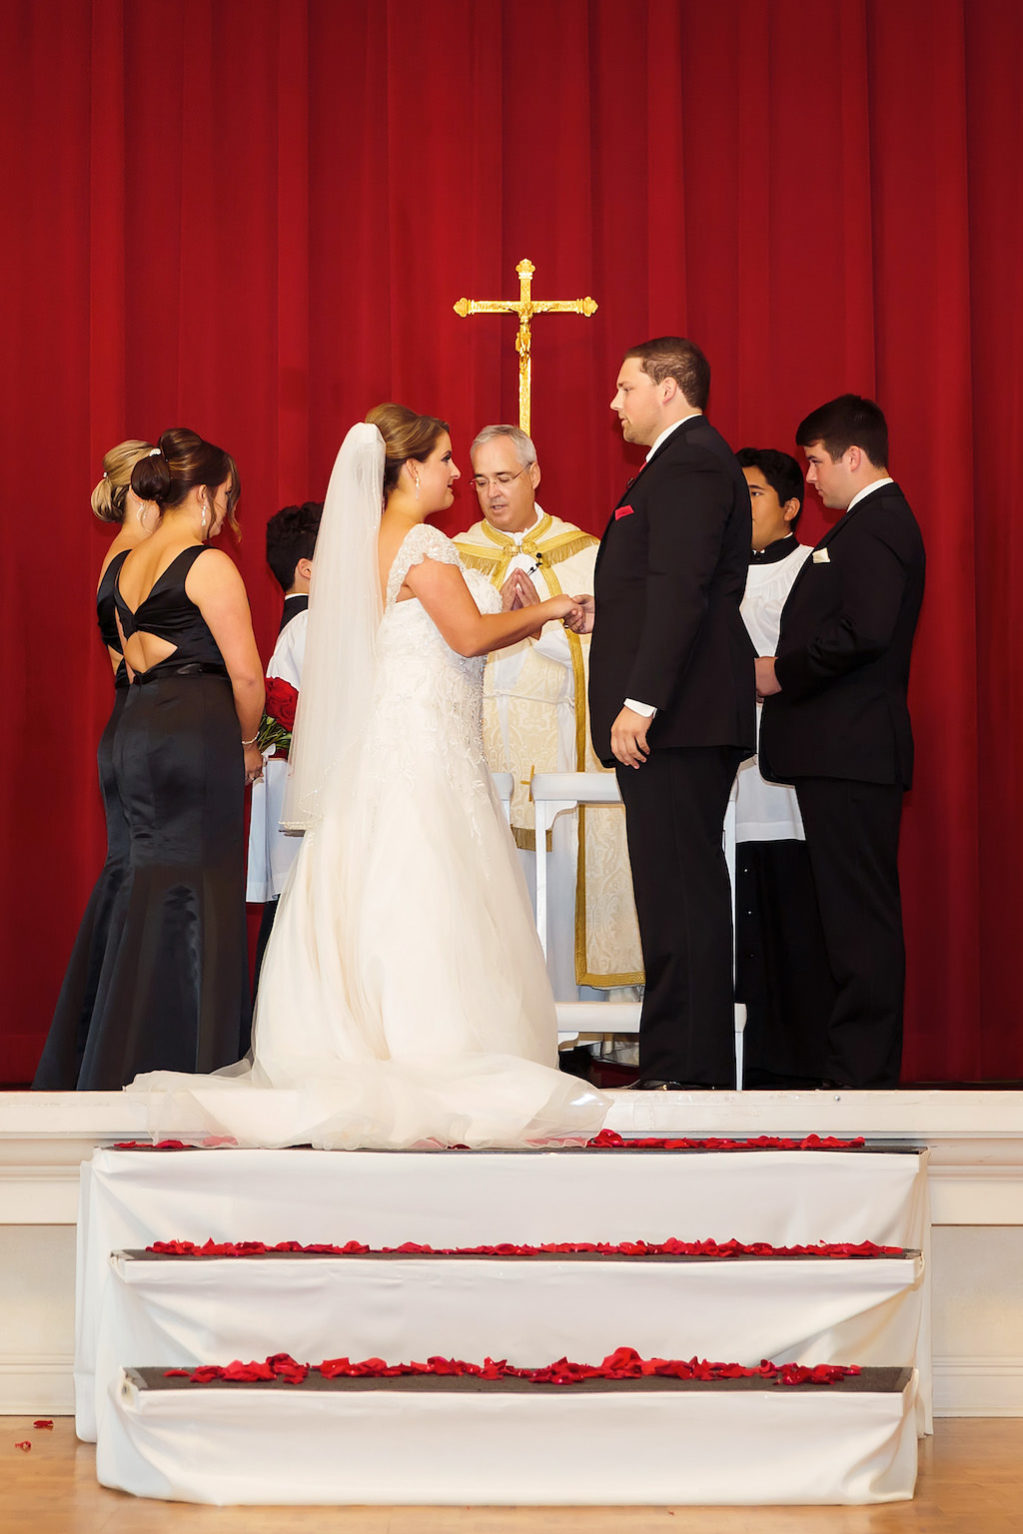 Classic Traditional Wedding Ceremony with Red Rose Petal Aisle | Ybor City Wedding Venue The Italian Club